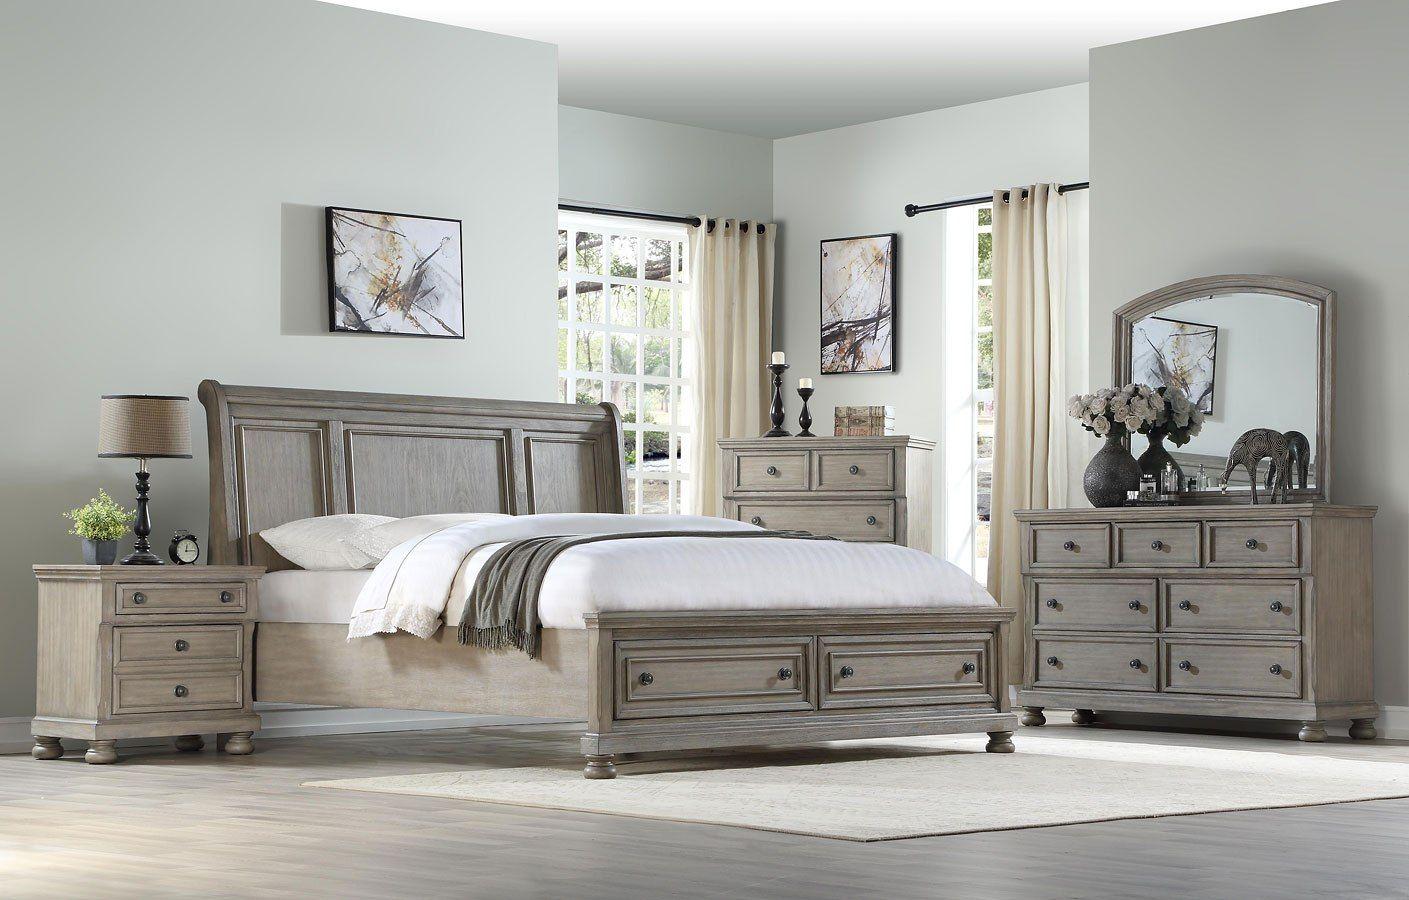 Ashcott Sleigh Storage Bedroom Set Furniture, Home